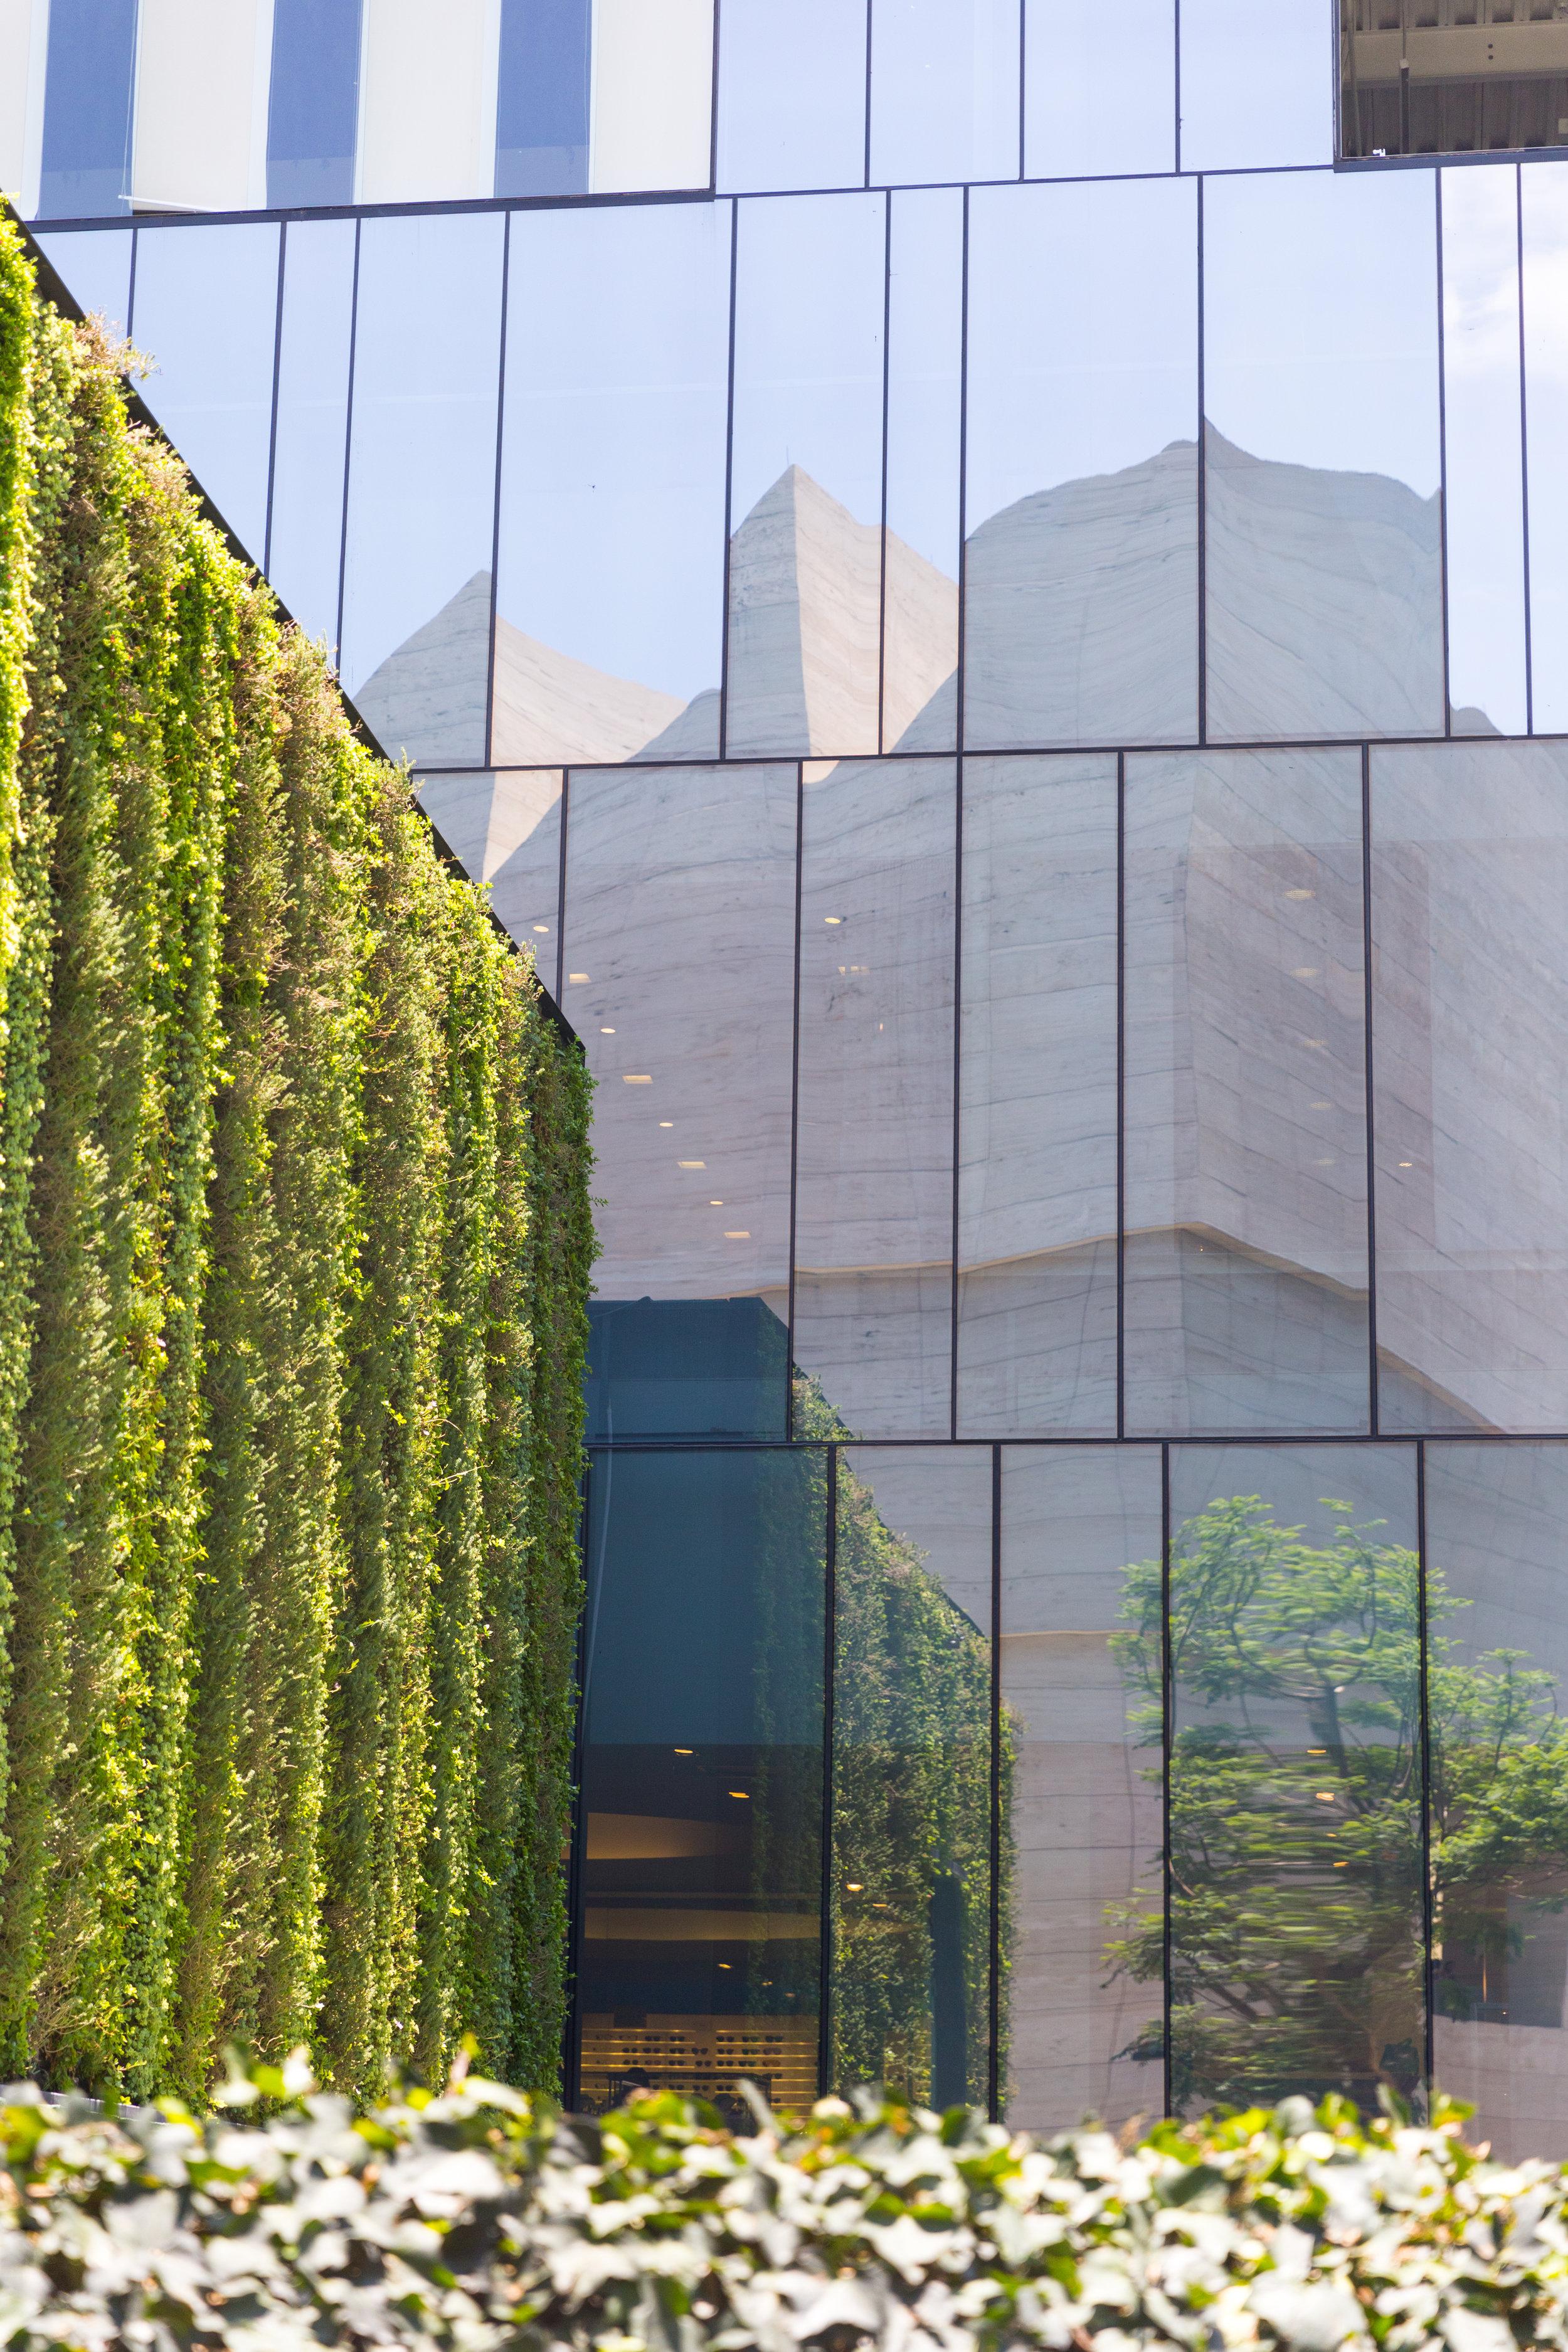 Mexico City Centro Historico-10.jpg